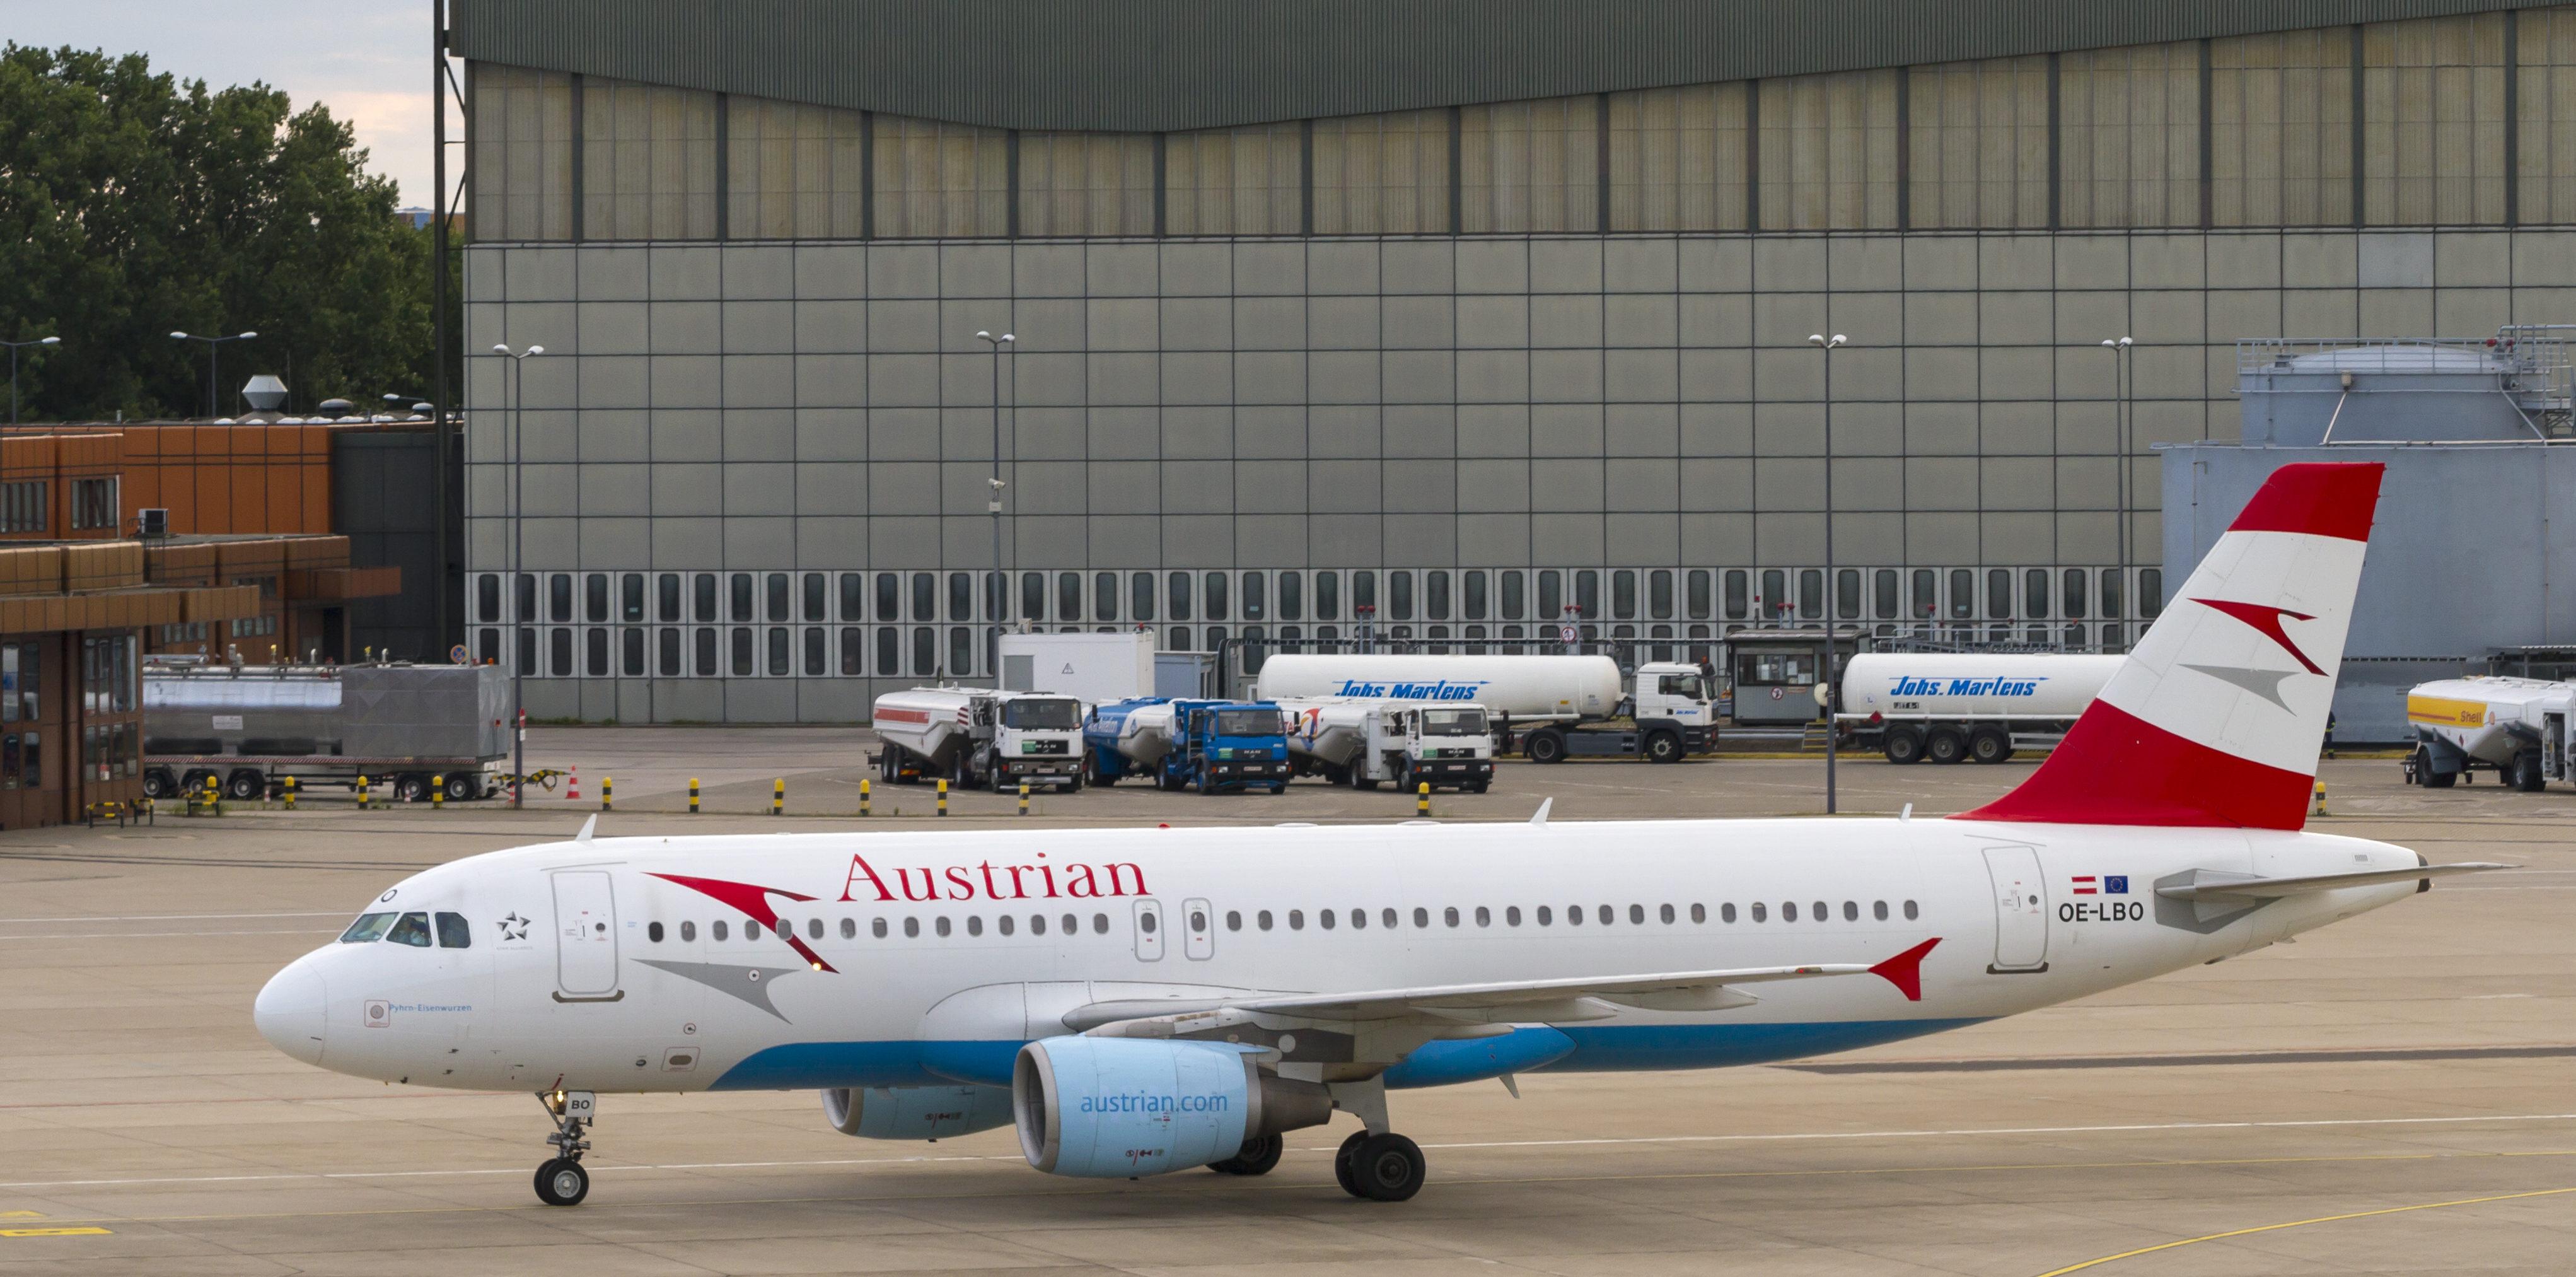 En Airbus A320-200 fra Austrian Airlines. Foto: © Thorbjørn Brunander Sund, Danish Aviation Photo